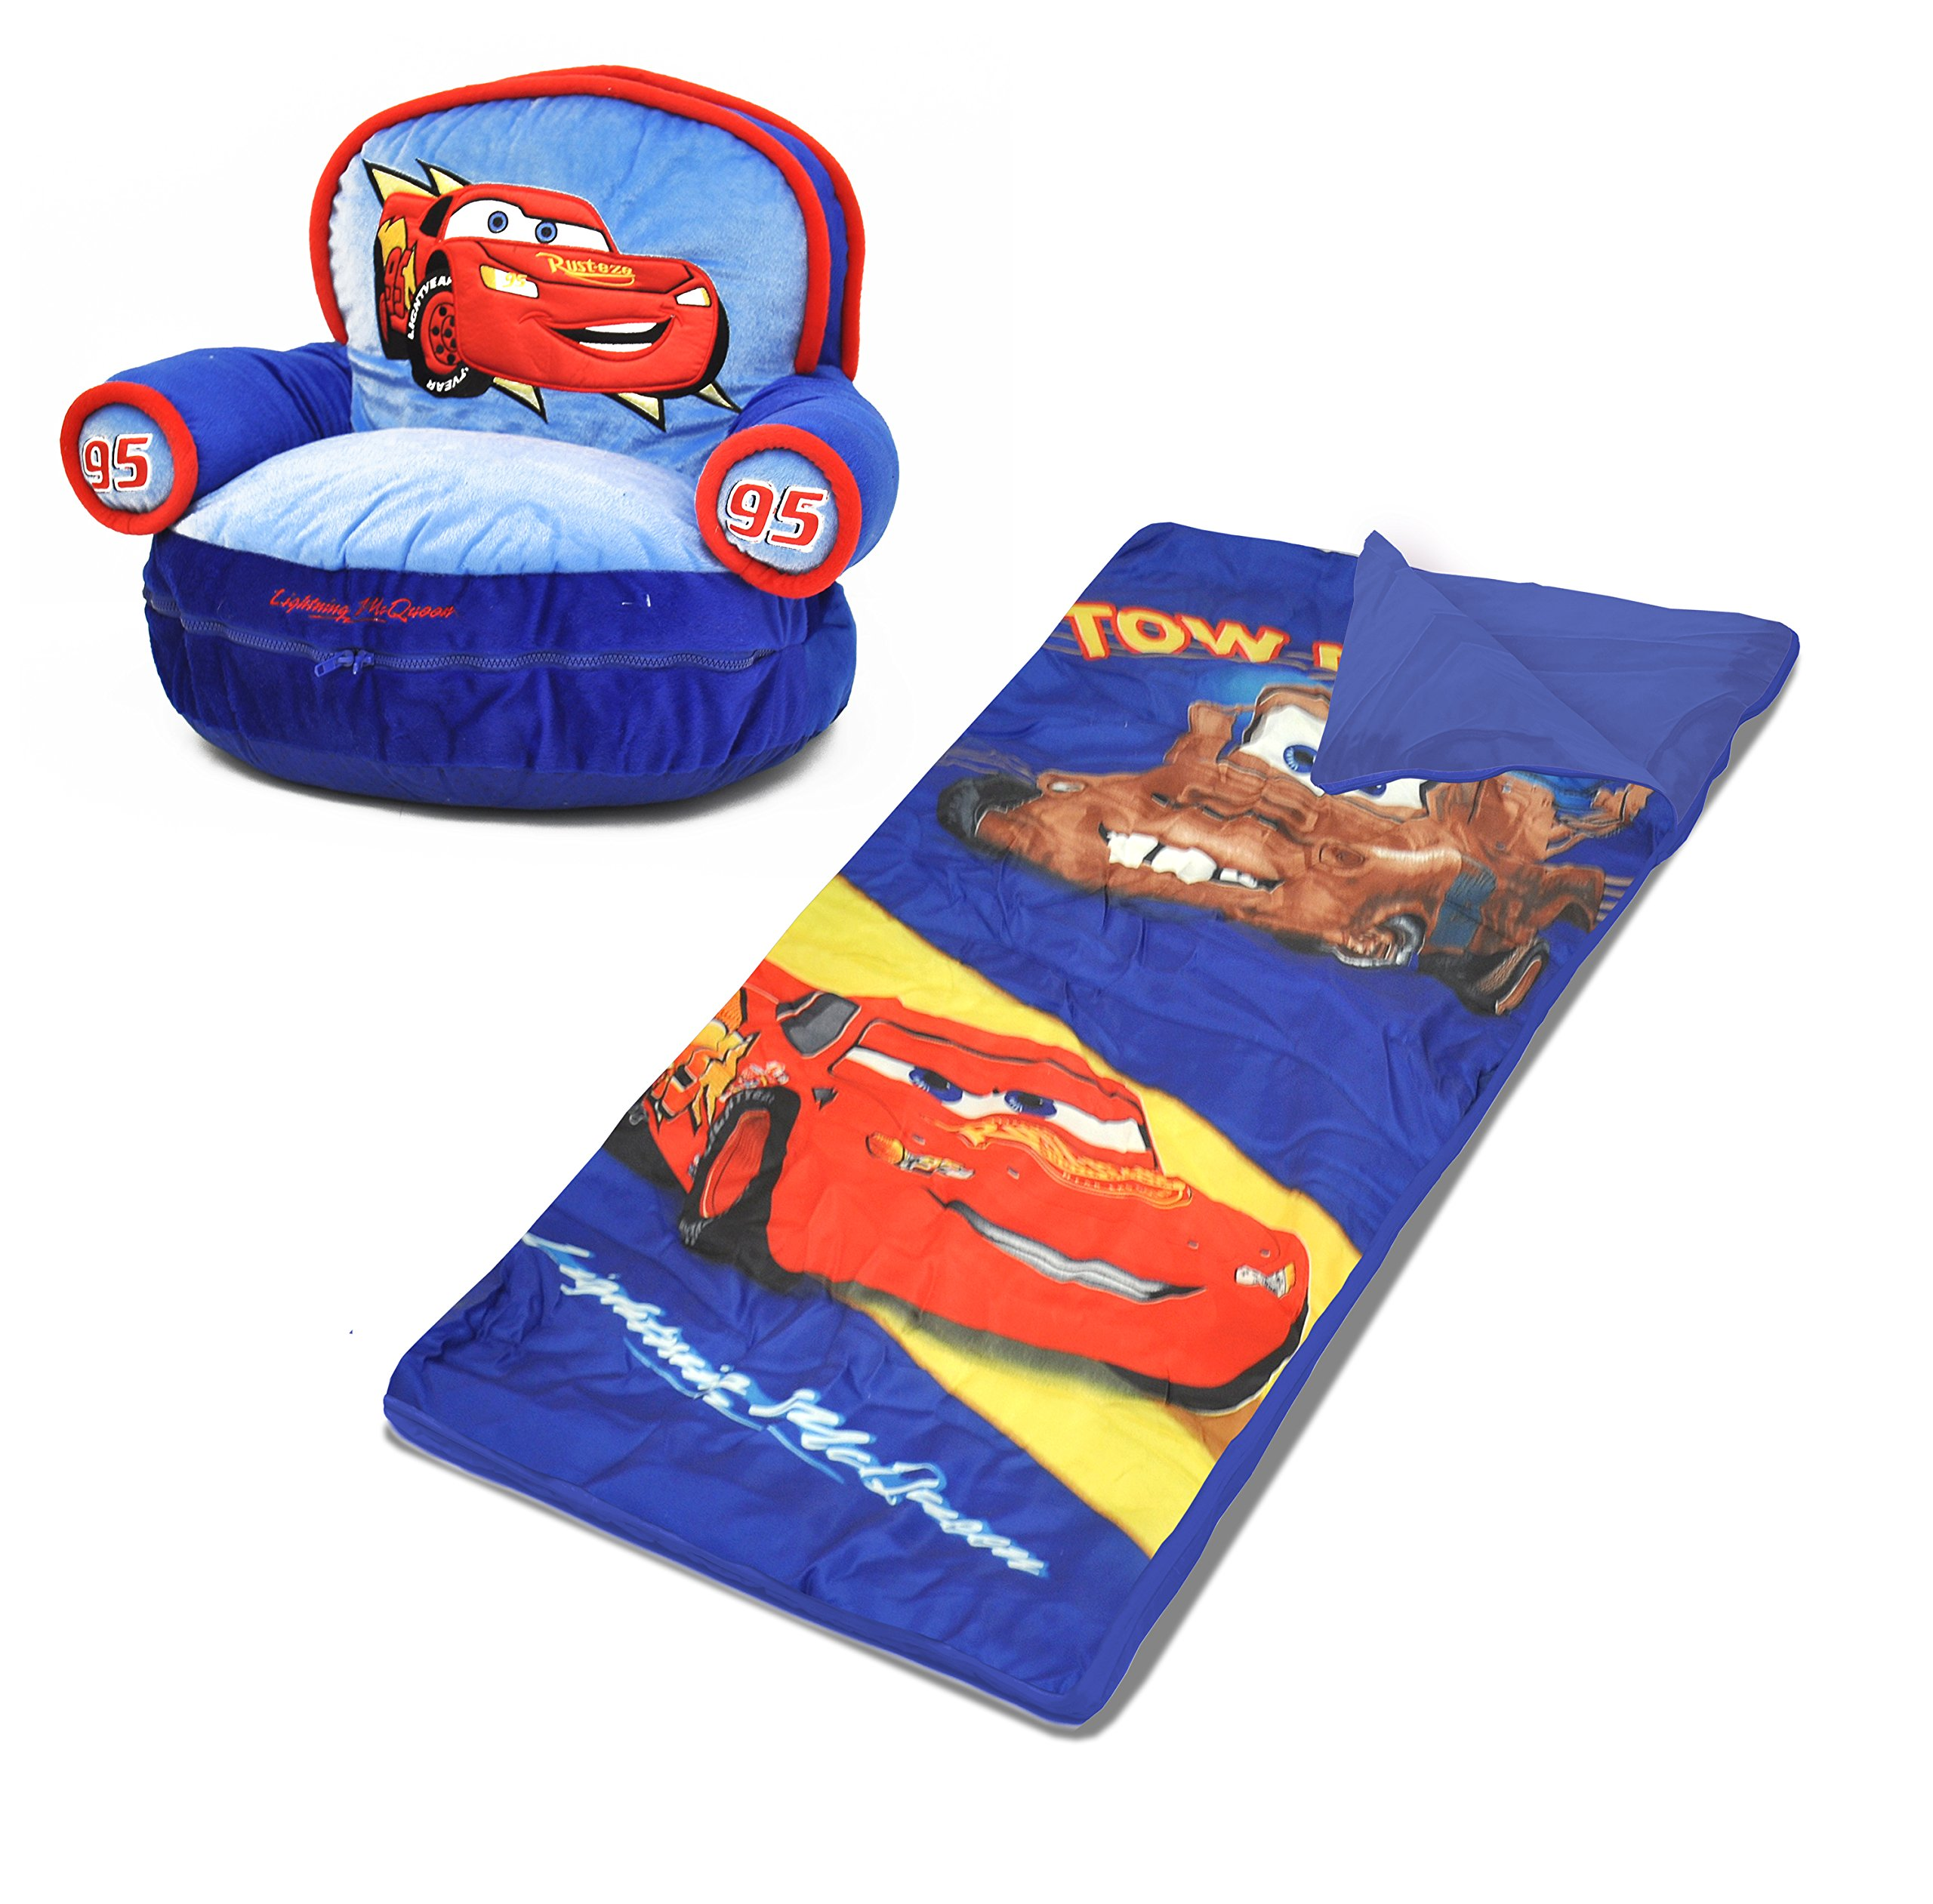 Disney Cars Sofa Chair with Slumber